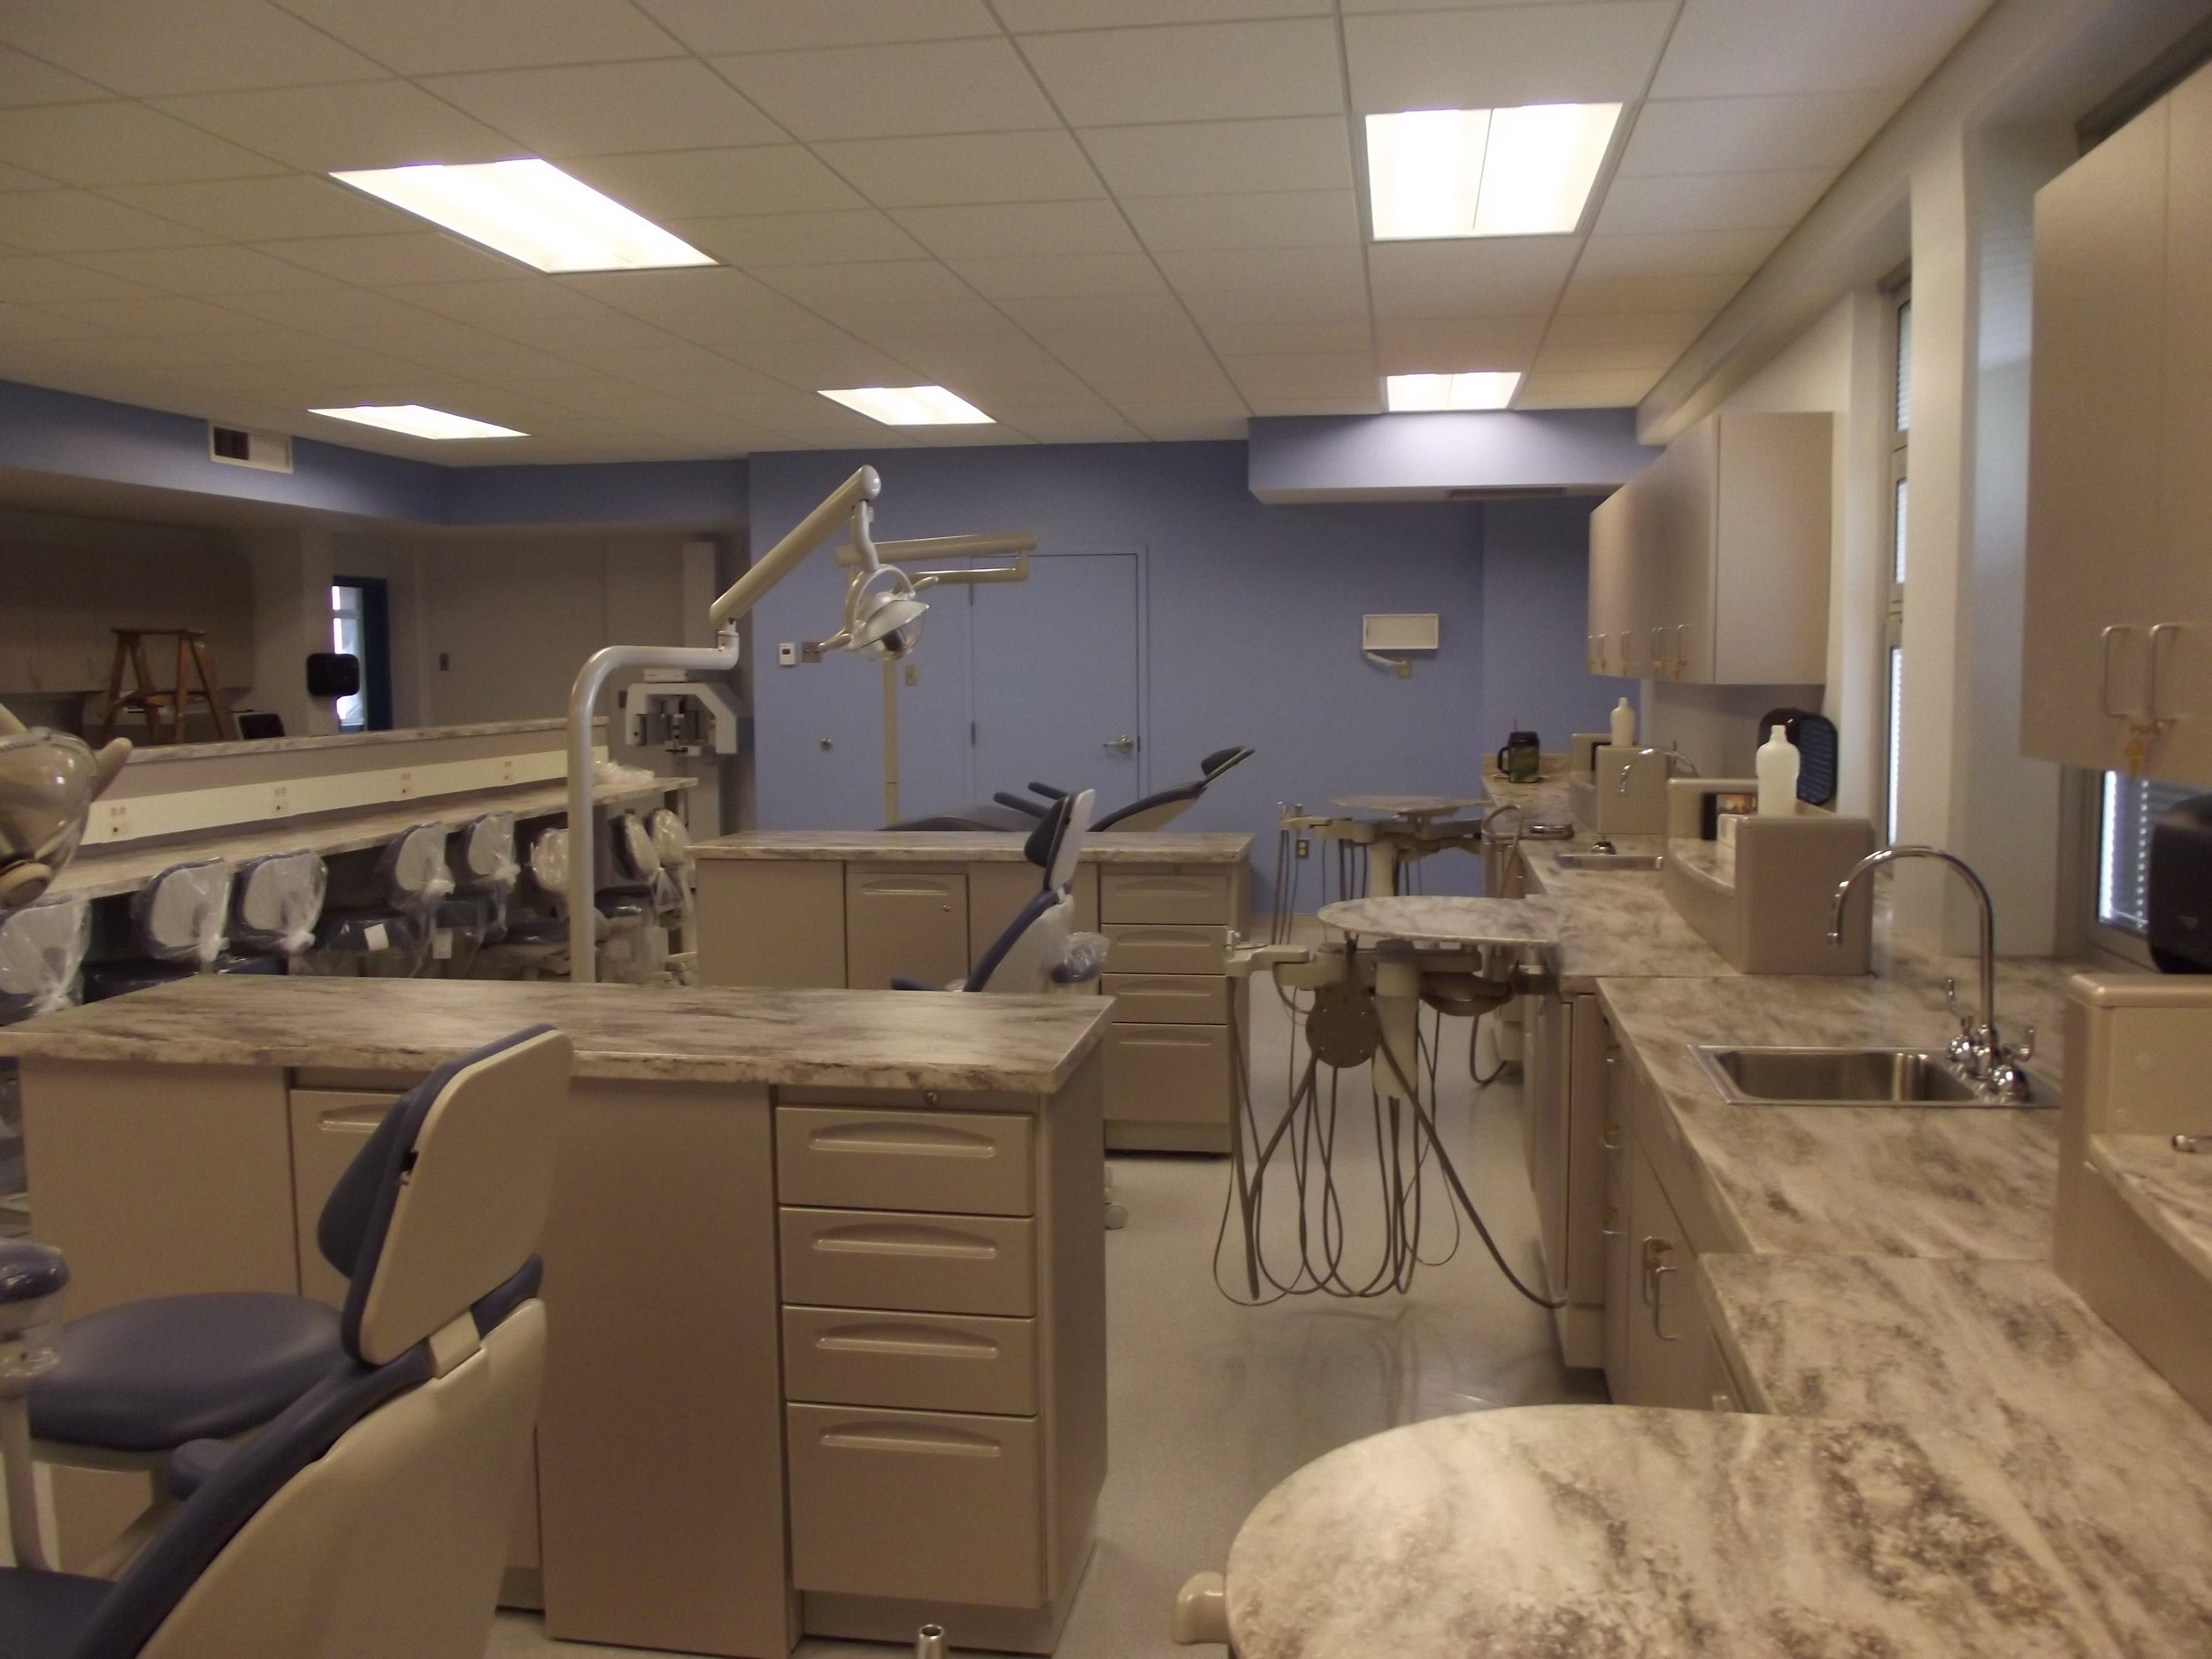 Vivien Thomas Dental Lab Renovations